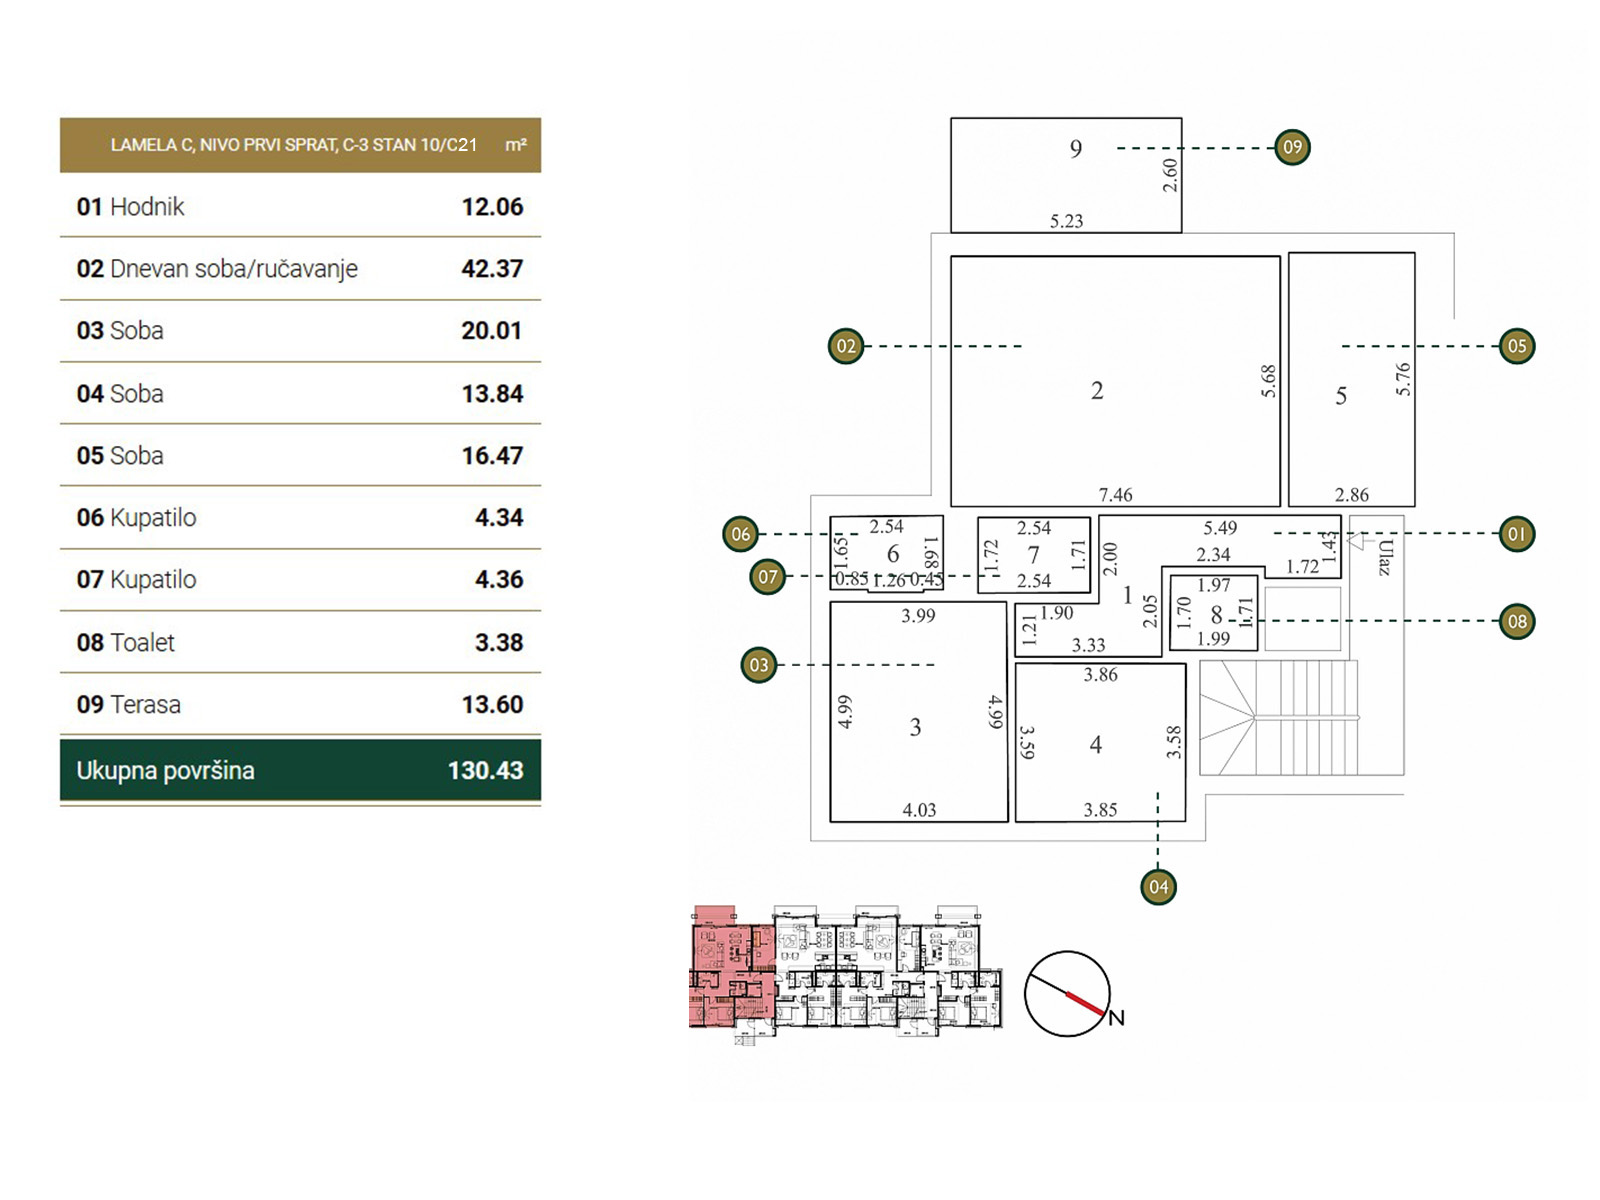 Ground floor - C21.